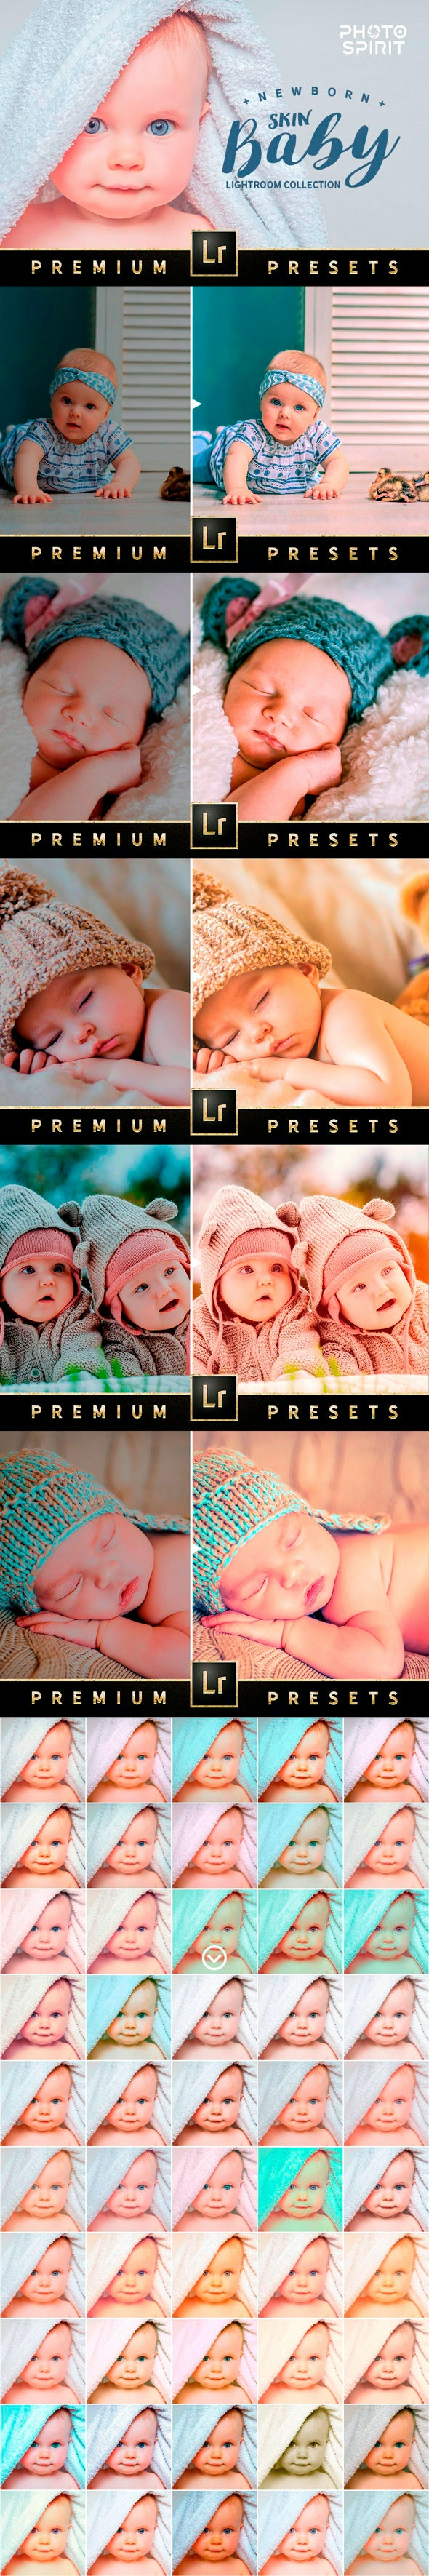 Newborn Baby Lightroom Collection - Lightroom Presets Add-ons